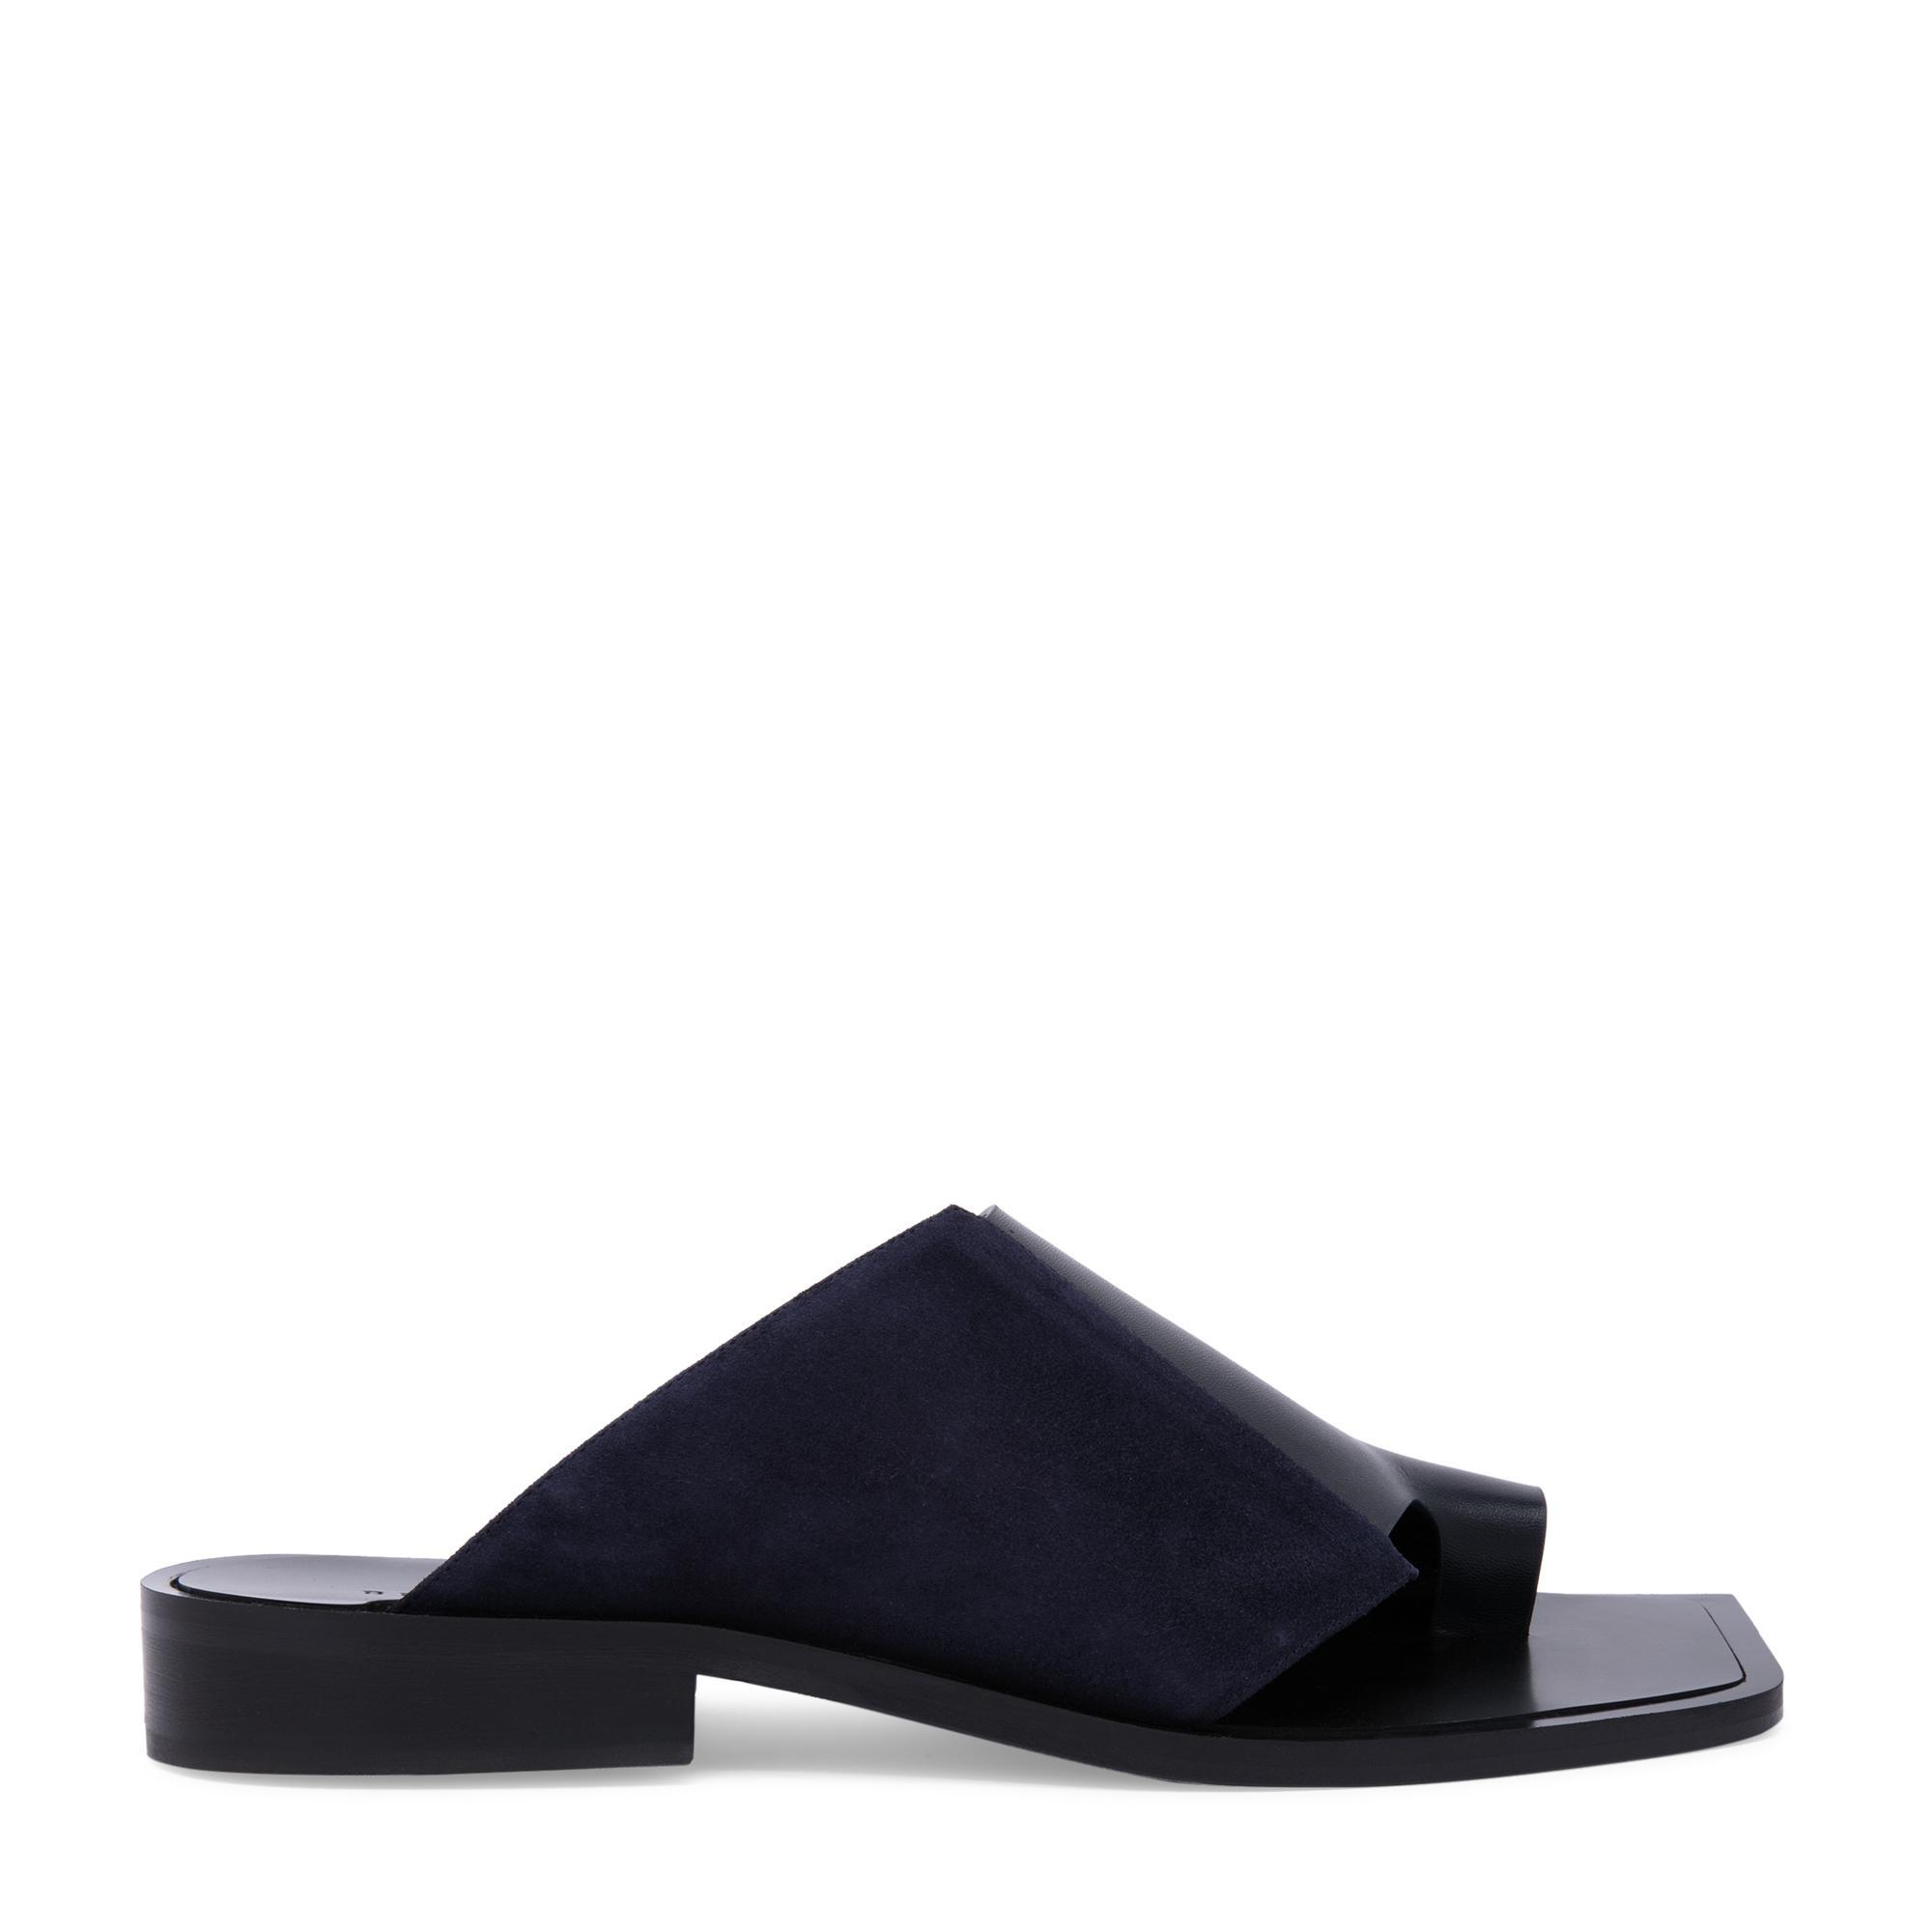 Apu sandals